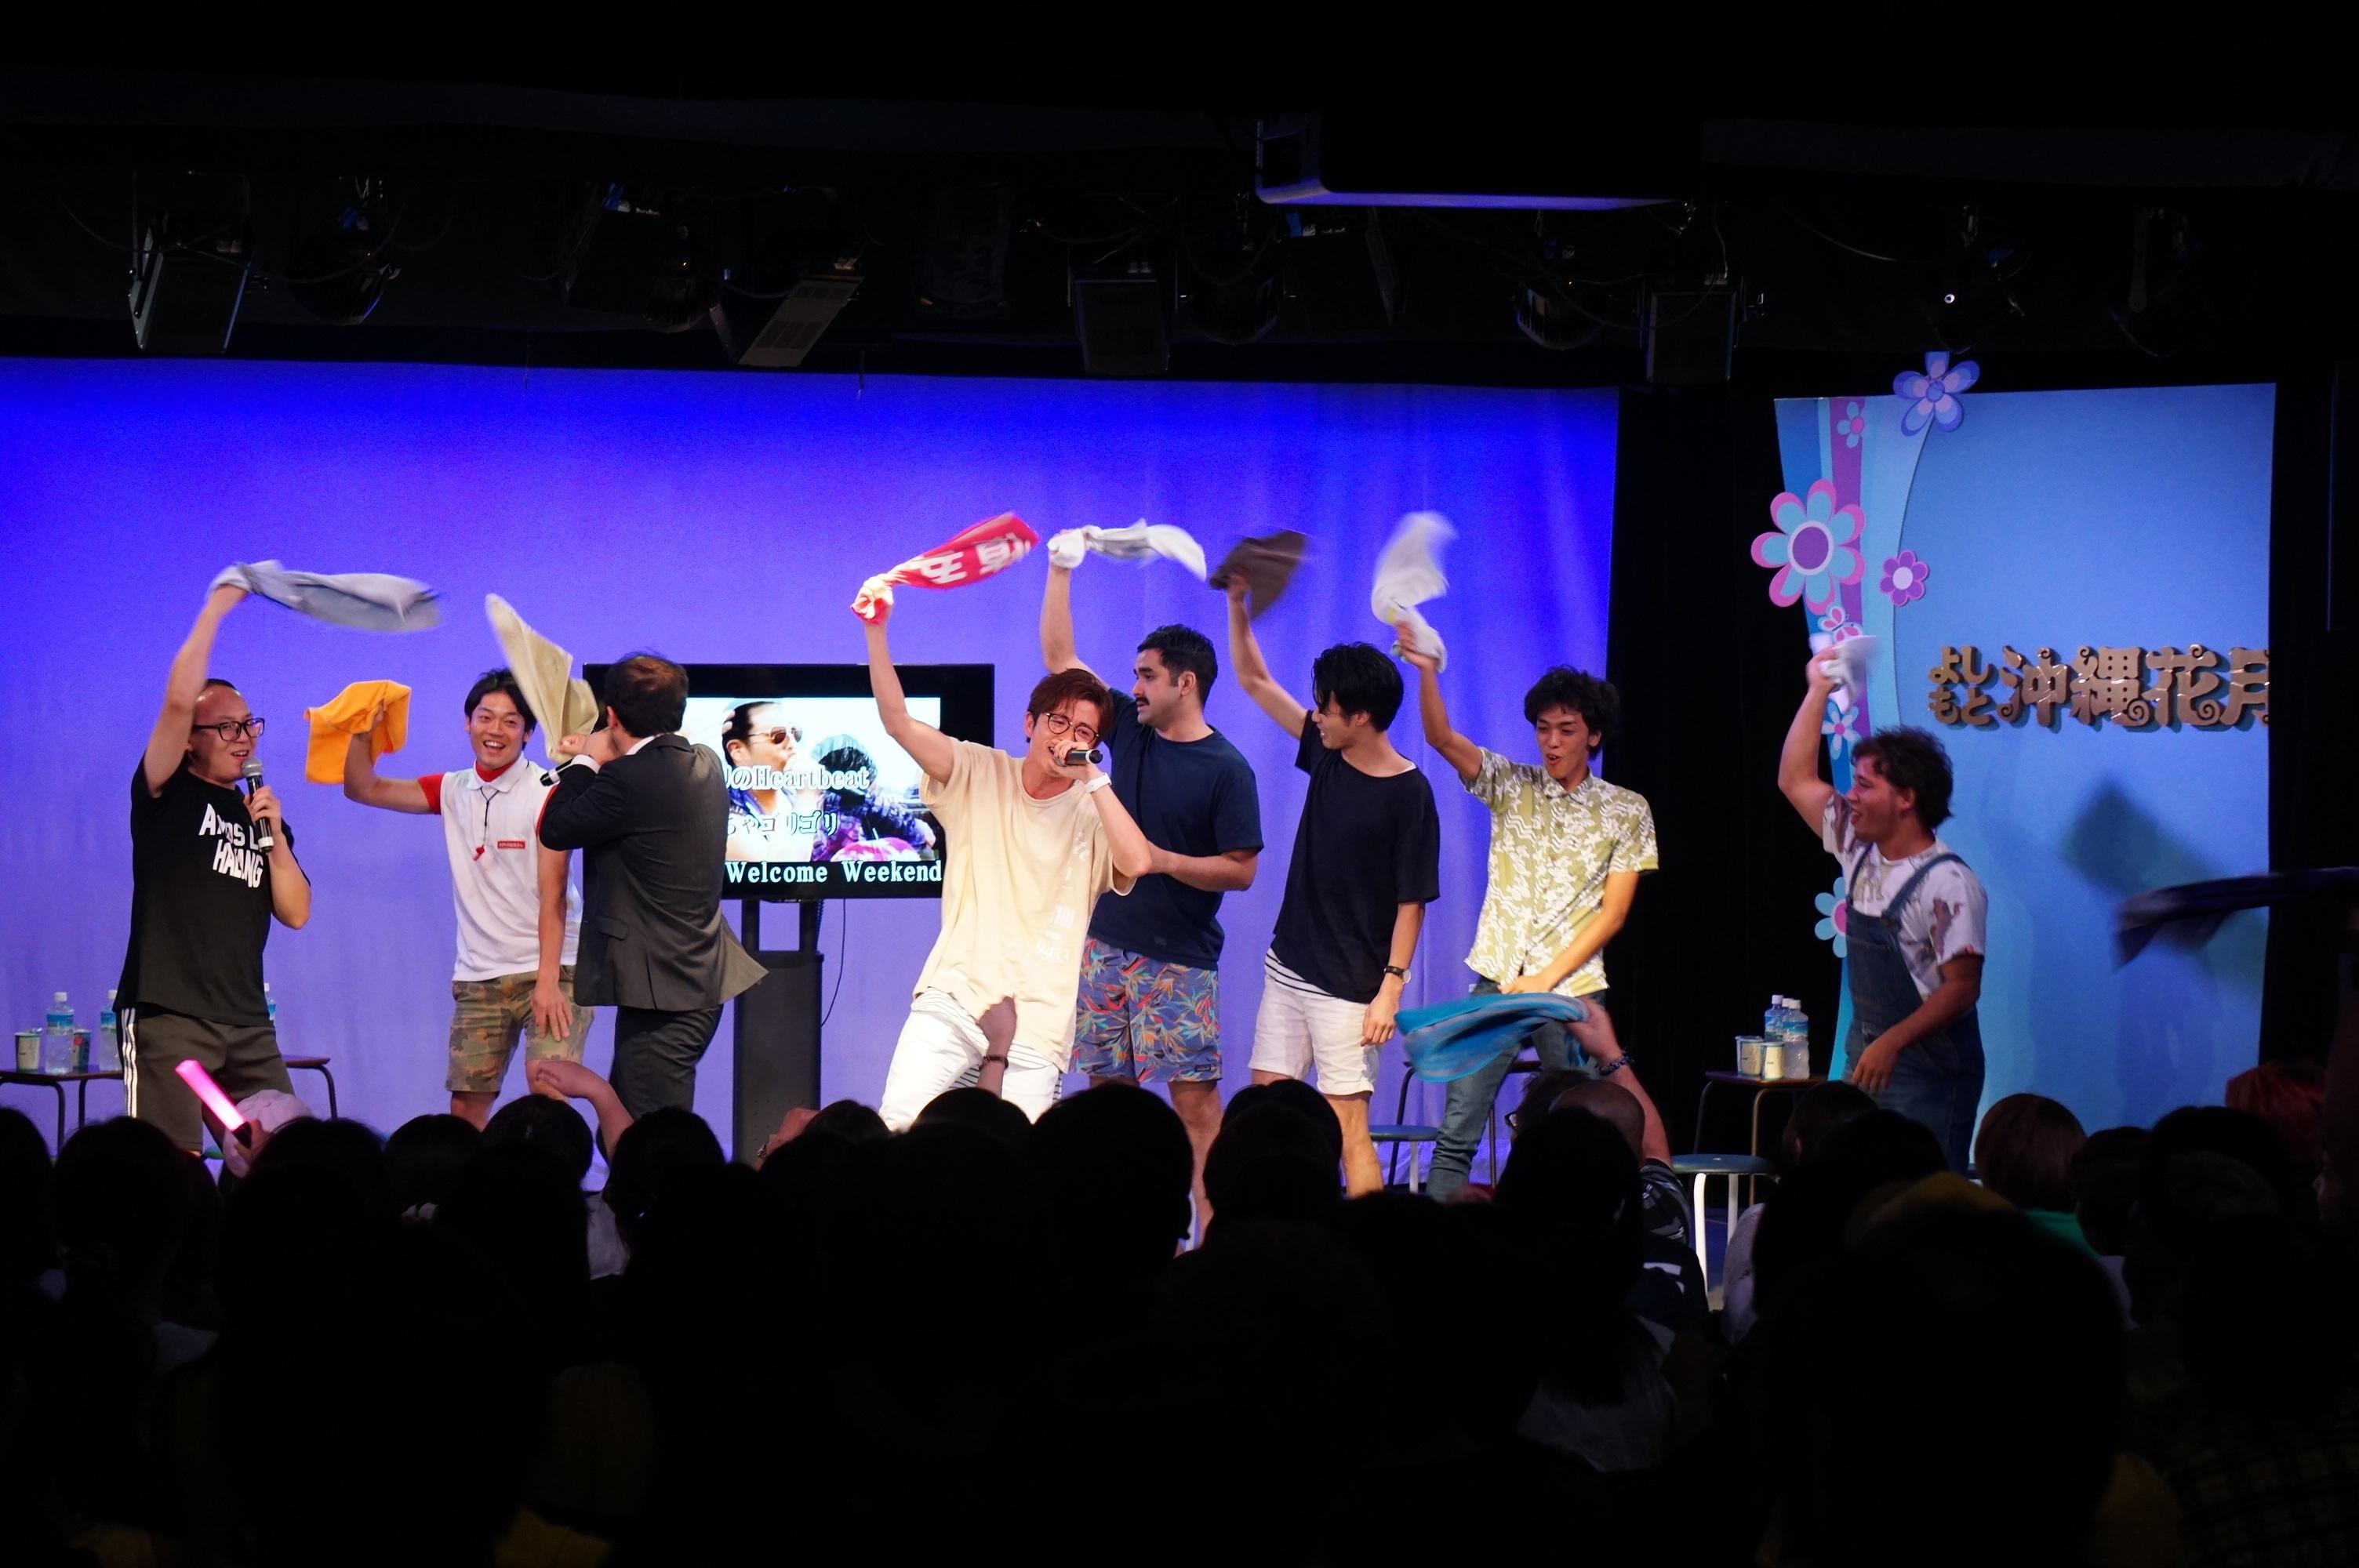 http://news.yoshimoto.co.jp/20160729181753-47ef301da03a369c6f066ee4723a9d7c36754021.jpg